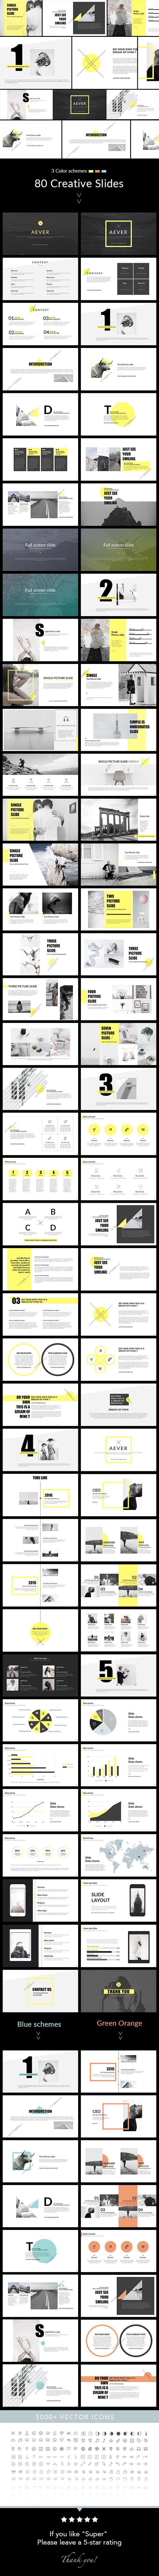 Best BRAND PPT Images On Pinterest Advertising Book Design - Unique product launch presentation ppt scheme